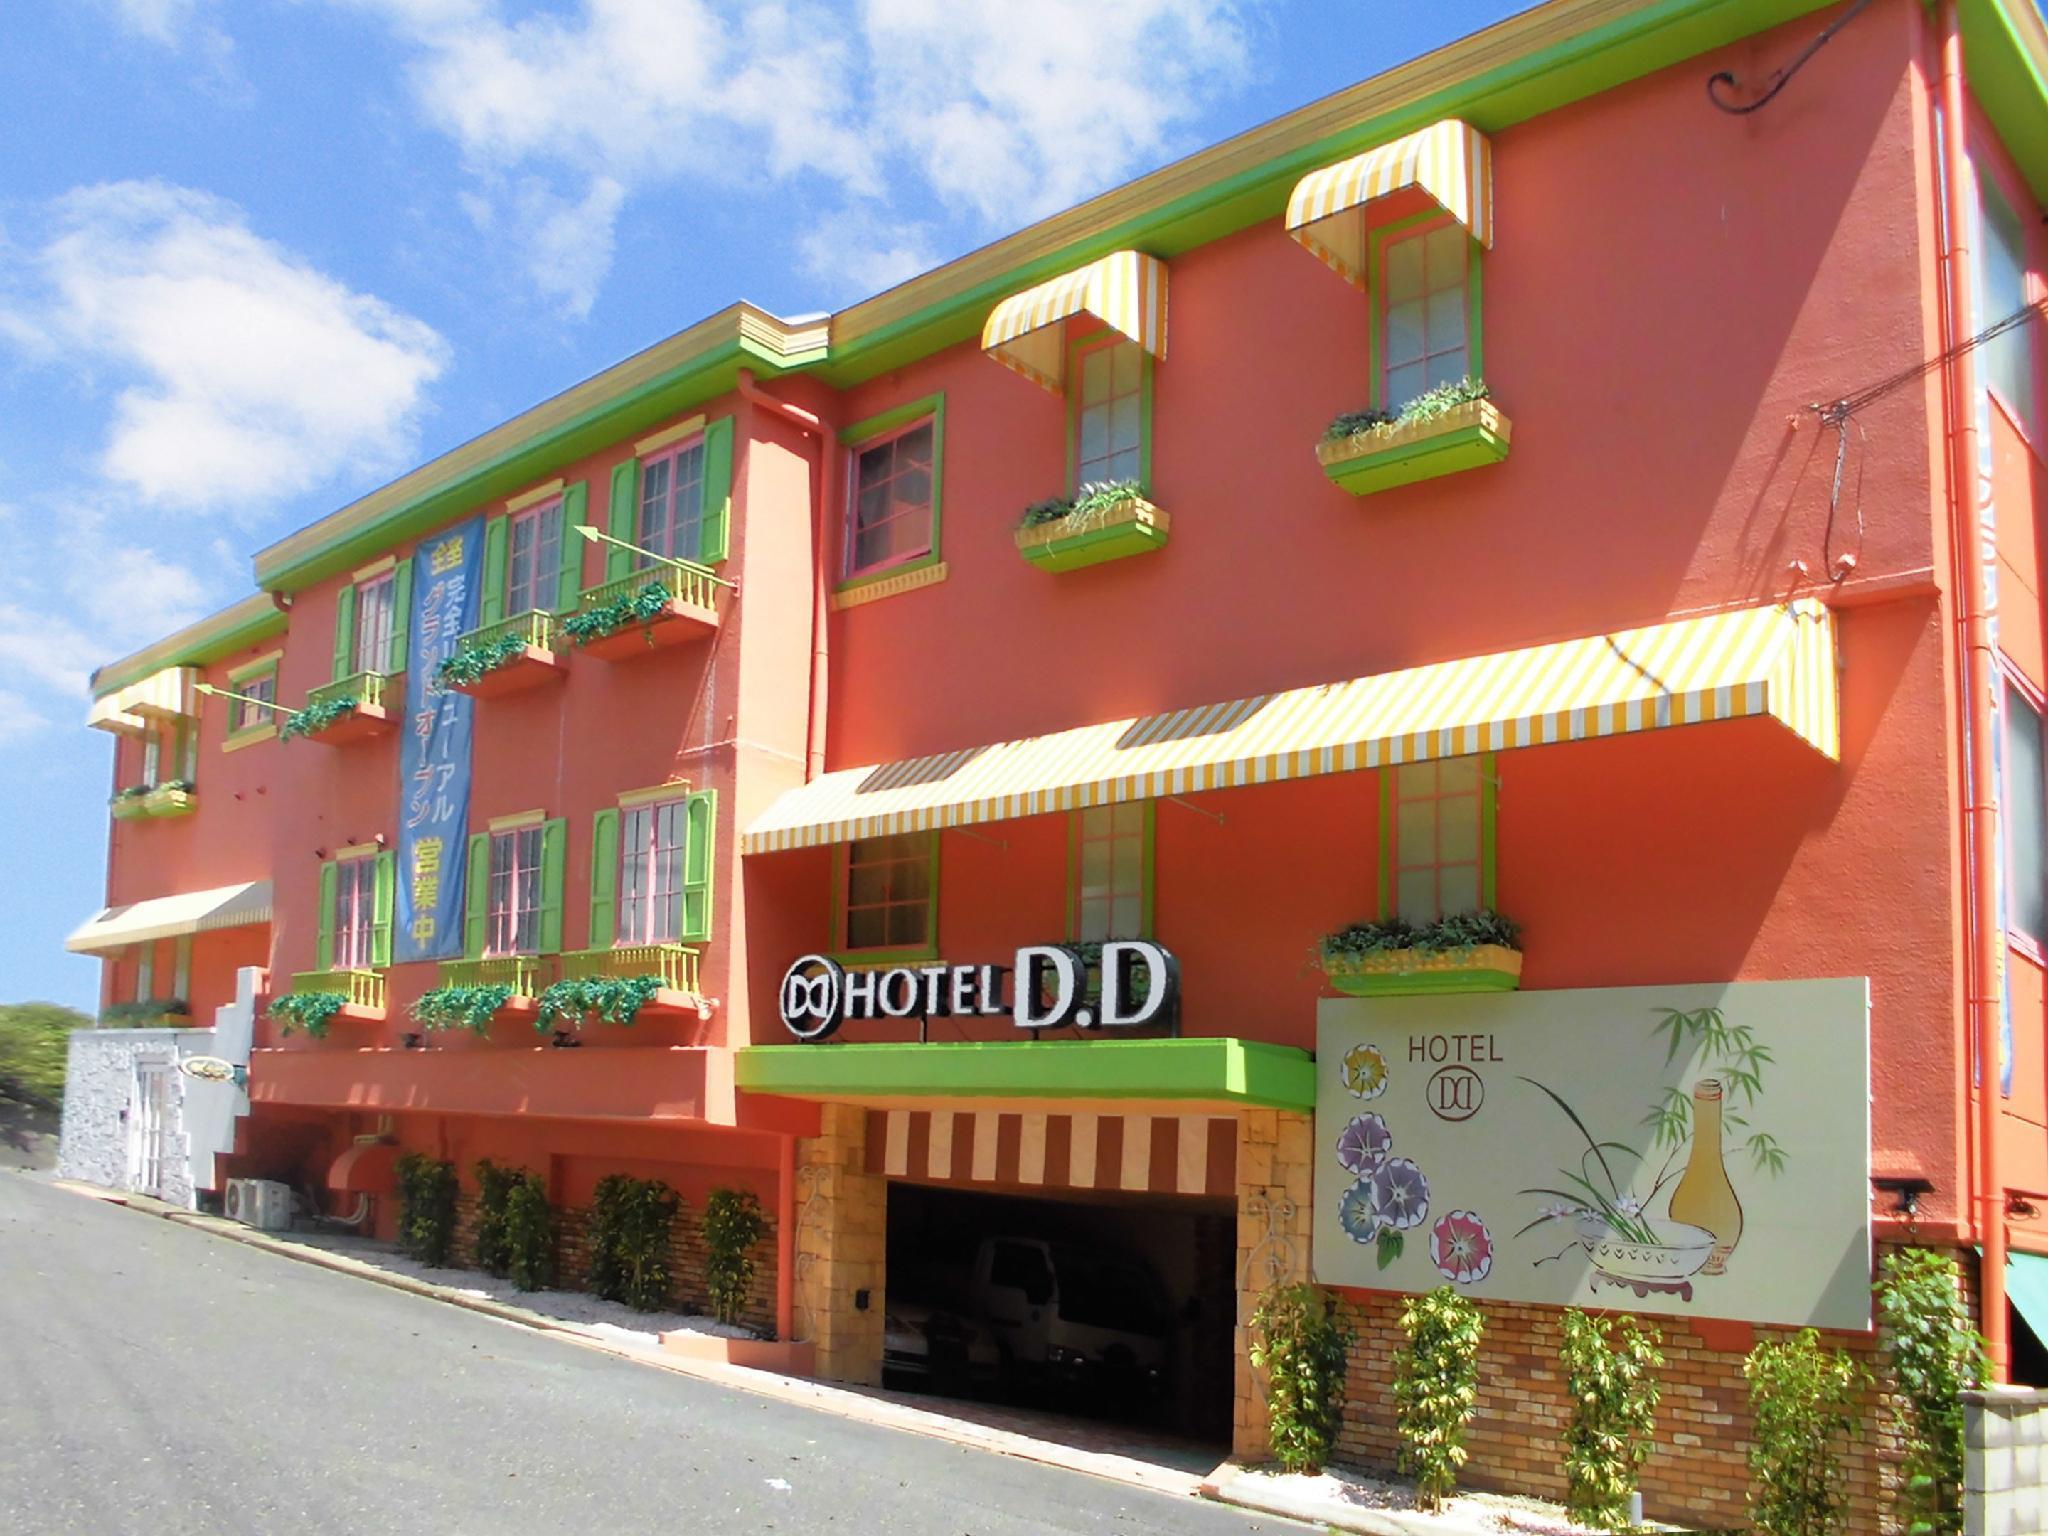 Hotel D.D Asuka Japan